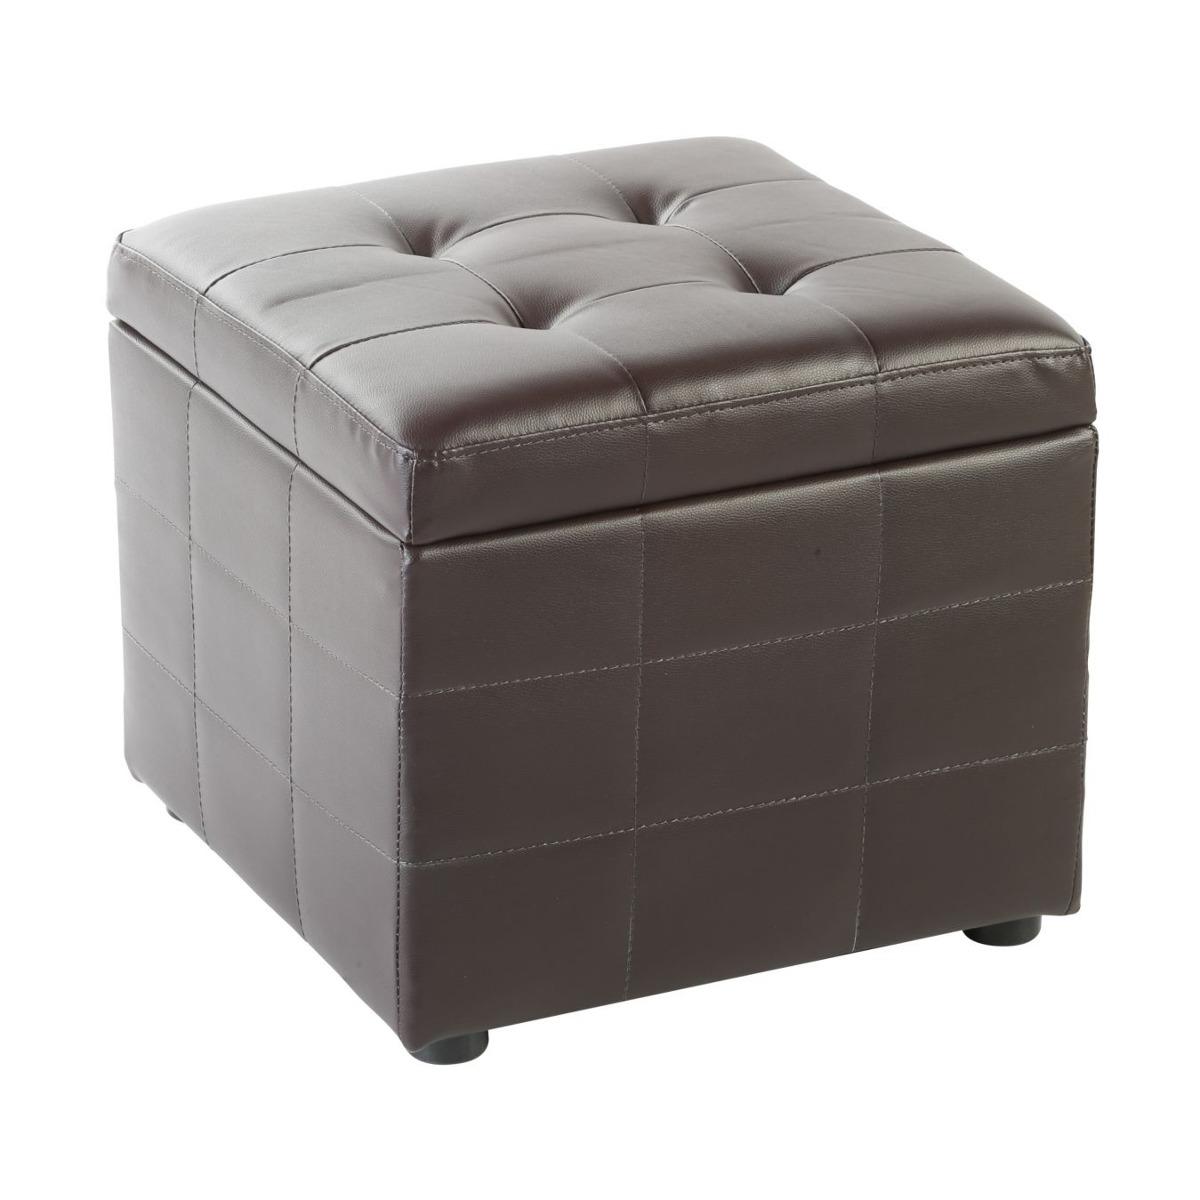 Puff Ottoman Cube Chocolate 45x45x40.5 Cm Muebles Sill Acu2 ...